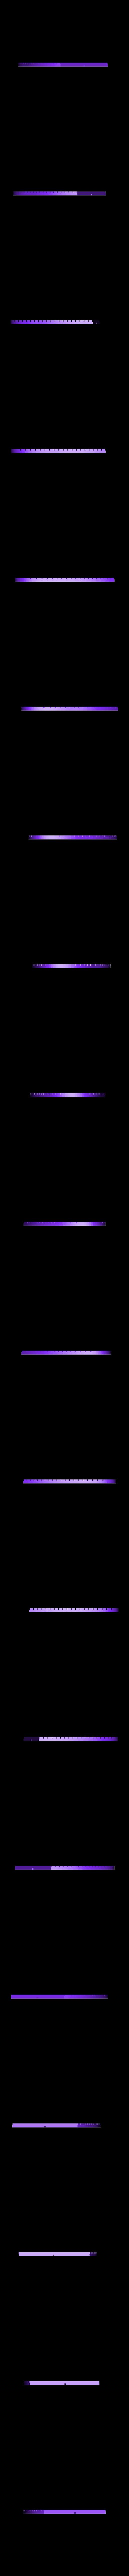 pointe.STL Download free STL file pedimeter • Object to 3D print, Thomy